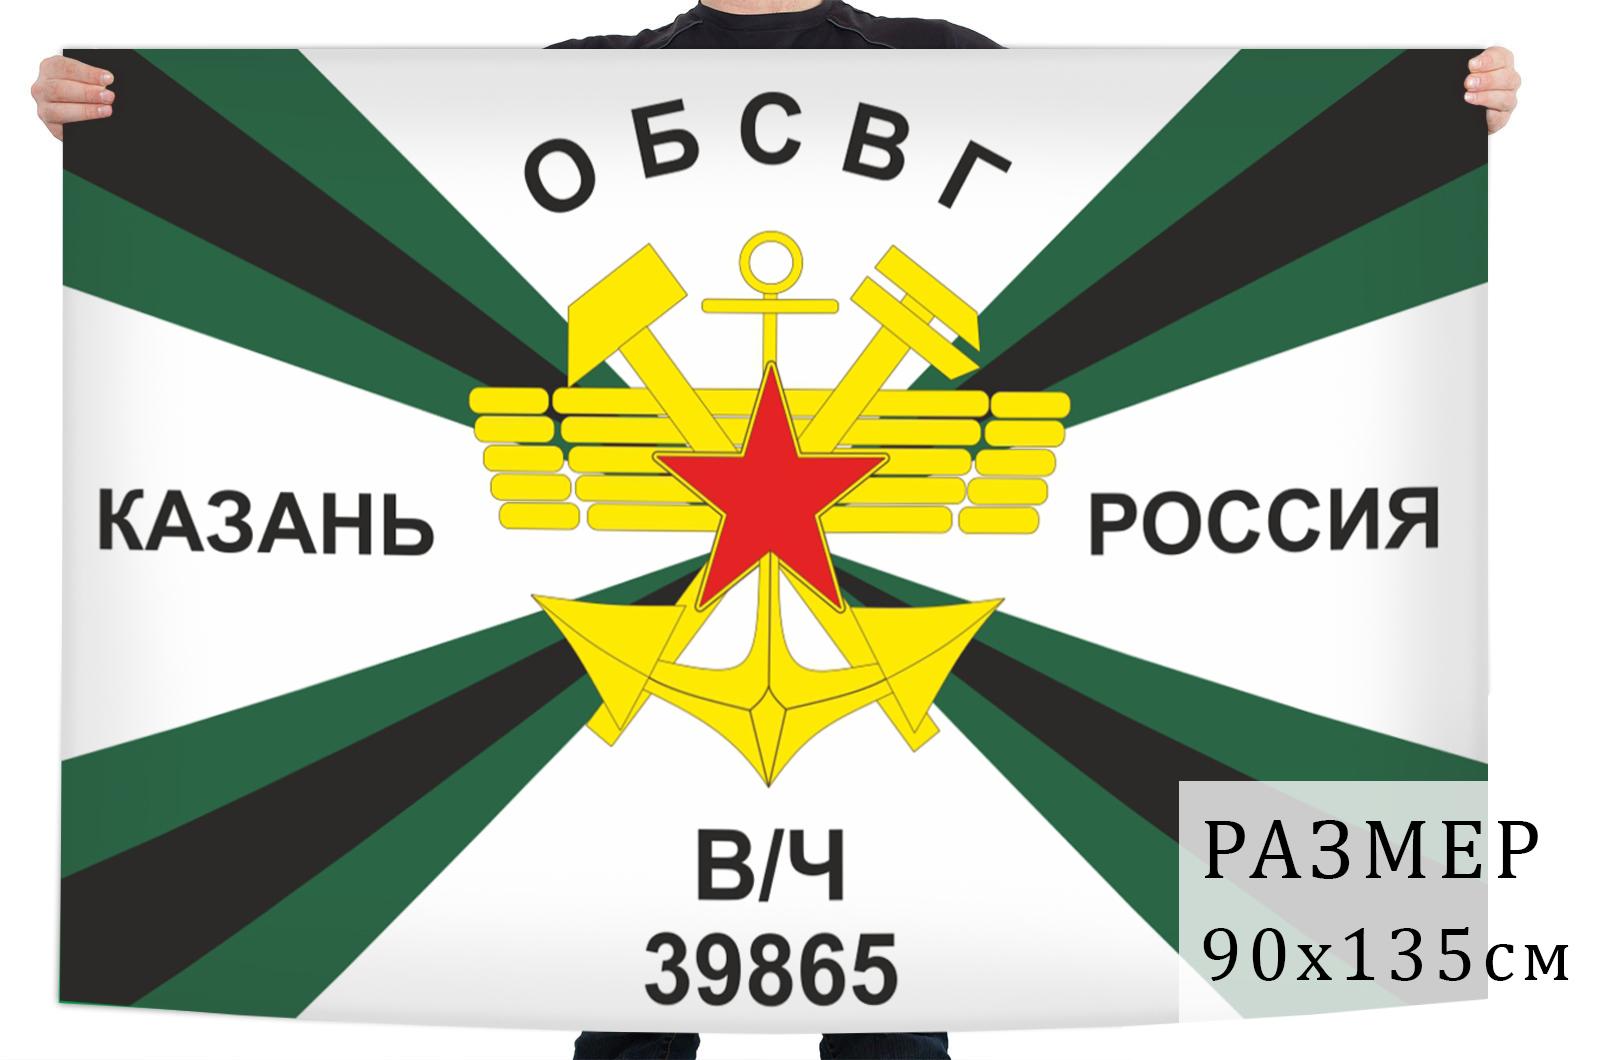 Заказать флаг ОБСВГ Казань Россия